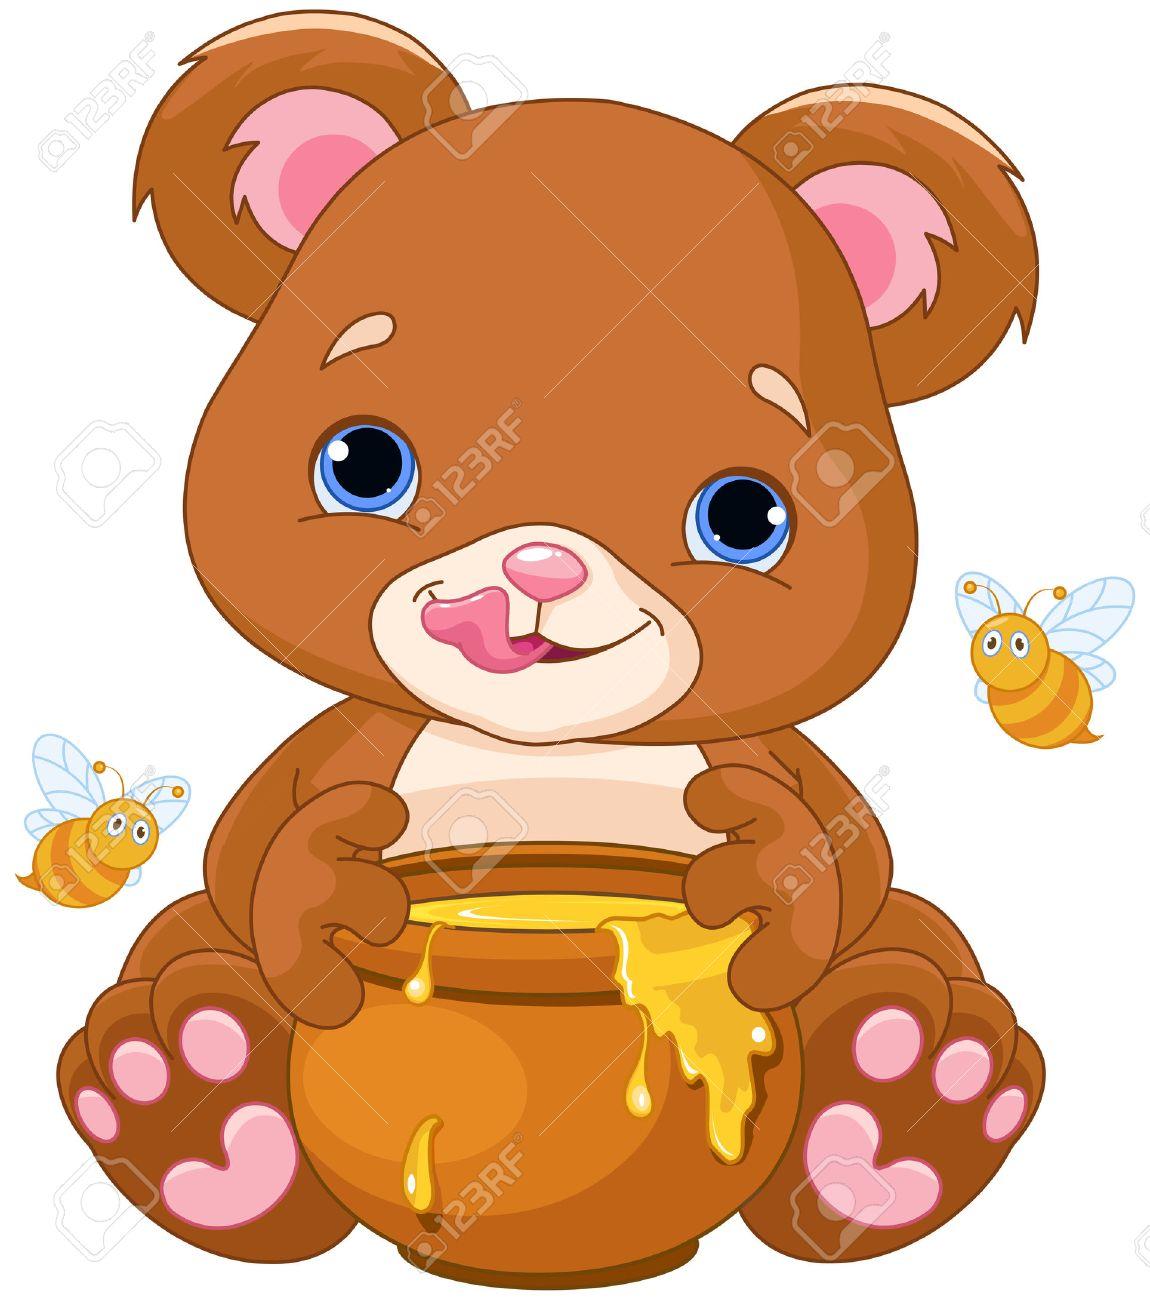 4 959 bear cub cliparts stock vector and royalty free bear cub rh 123rf com free bear cub clipart free bear cub clipart